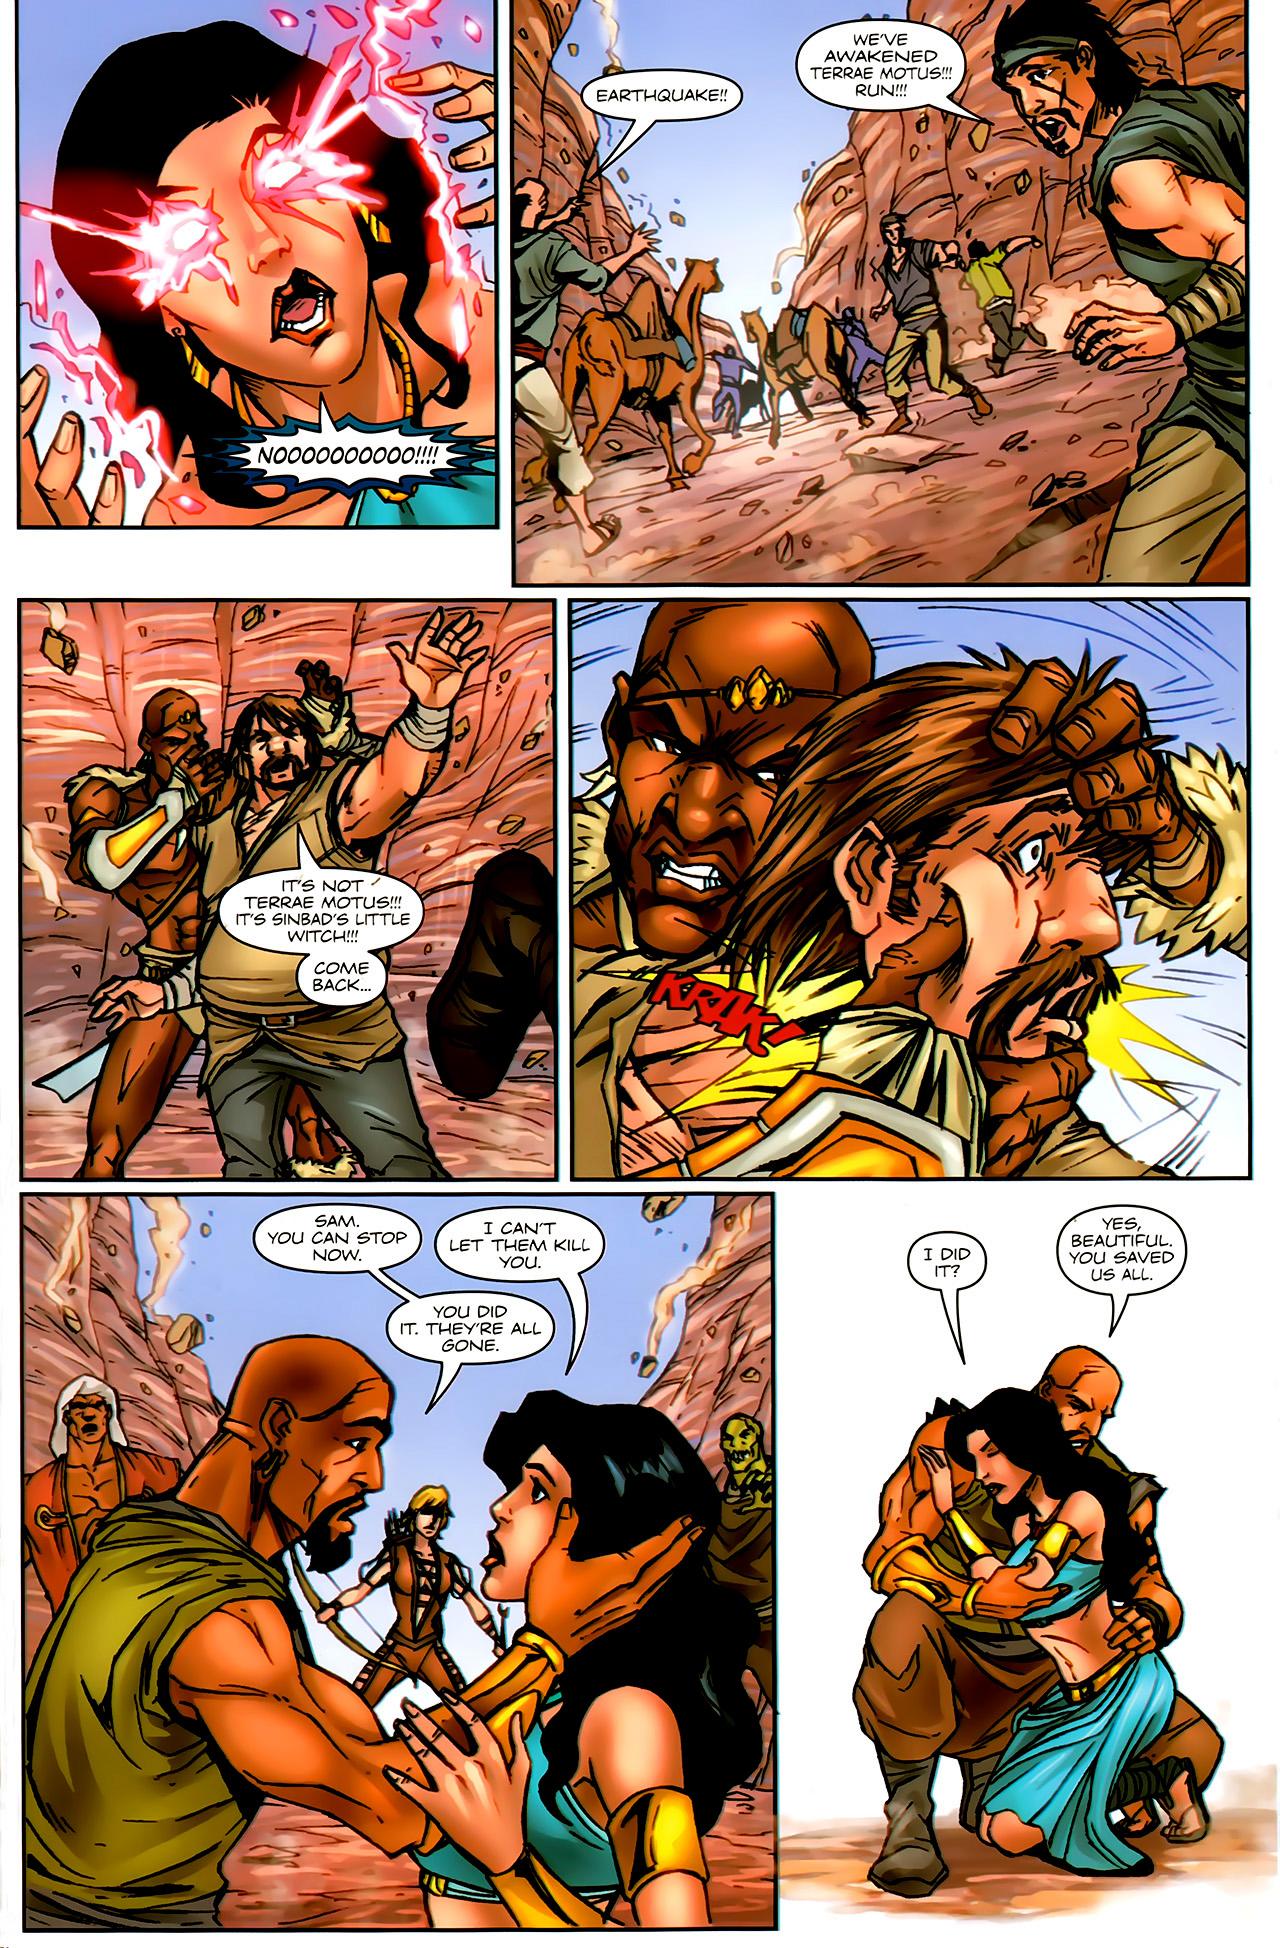 Read online 1001 Arabian Nights: The Adventures of Sinbad comic -  Issue #9 - 20